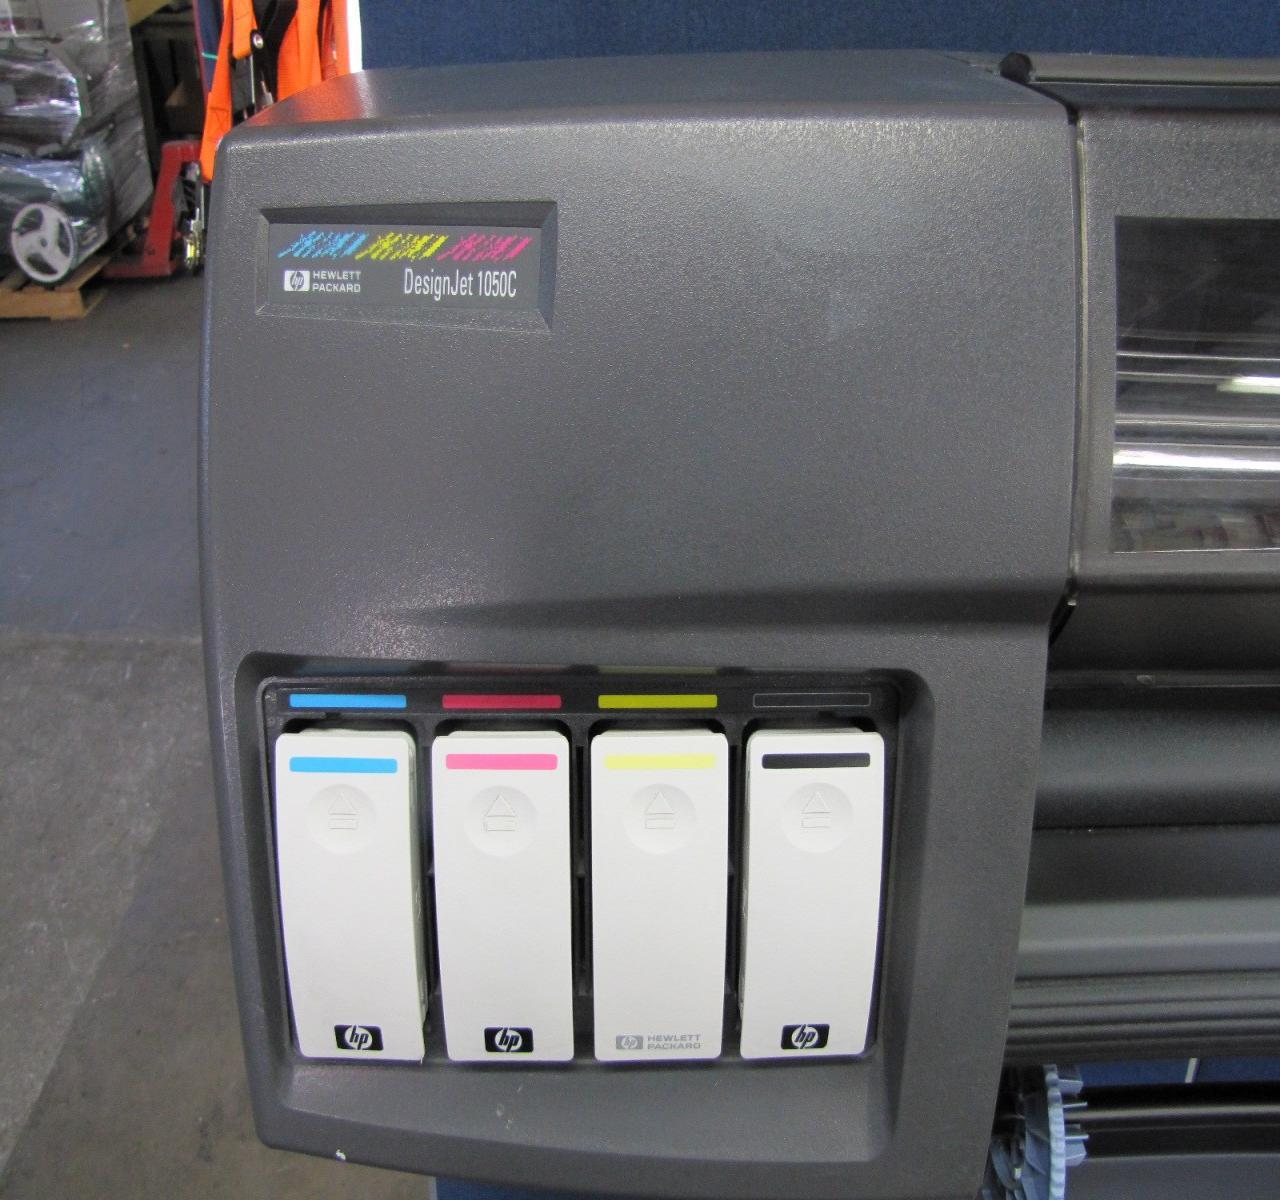 Lot 8 Hp Designjet 1050c C6074a Wide Format Printer